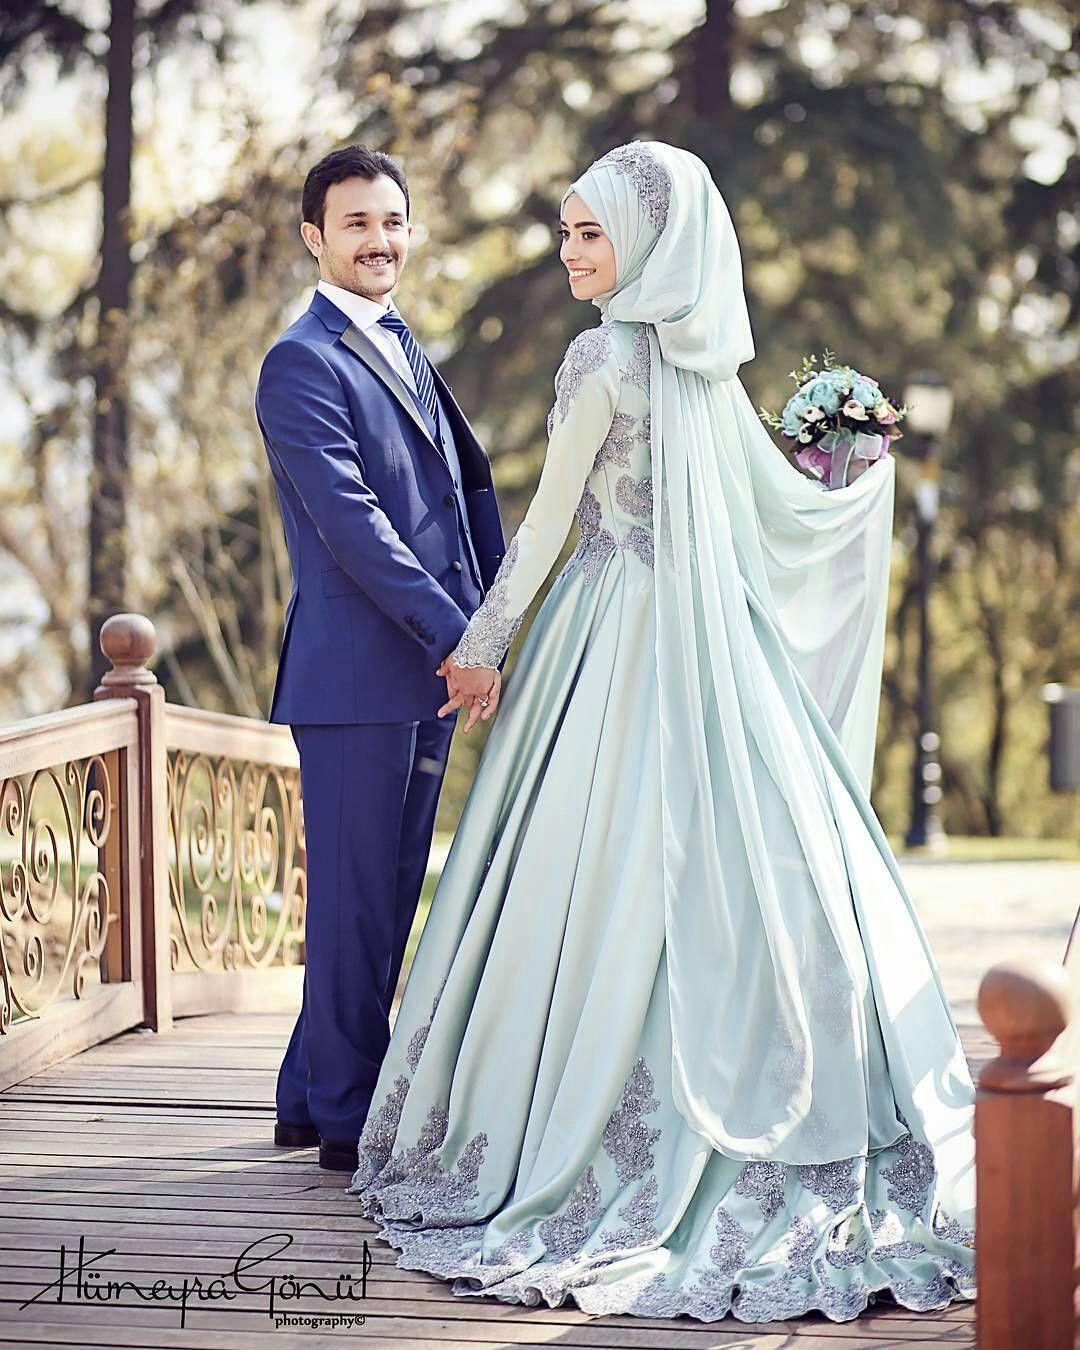 Pin by Asiah on Muslim Bridal Hijab(Niqab)~Bridesmaids | Pinterest ...